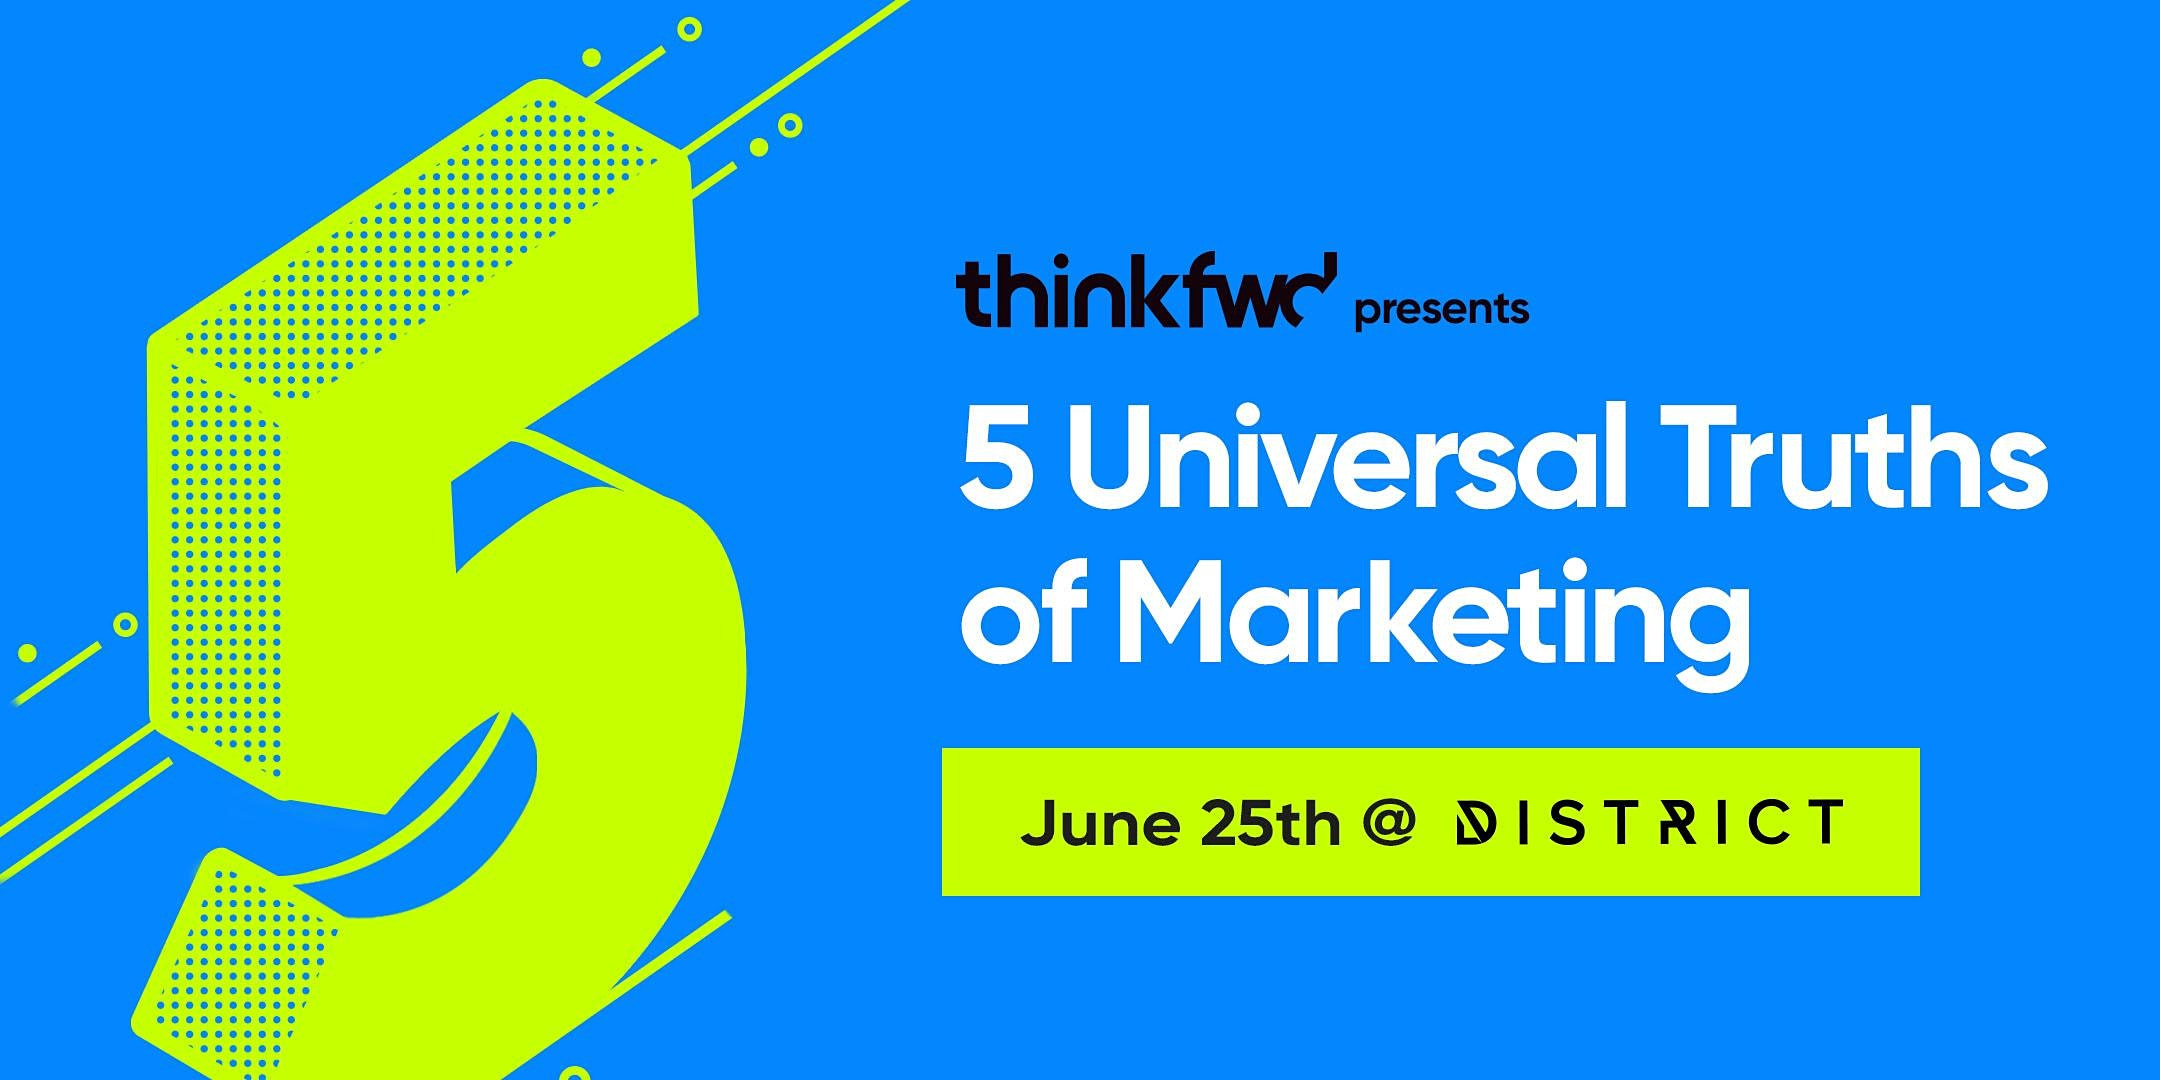 5 Universal Truths of Marketing